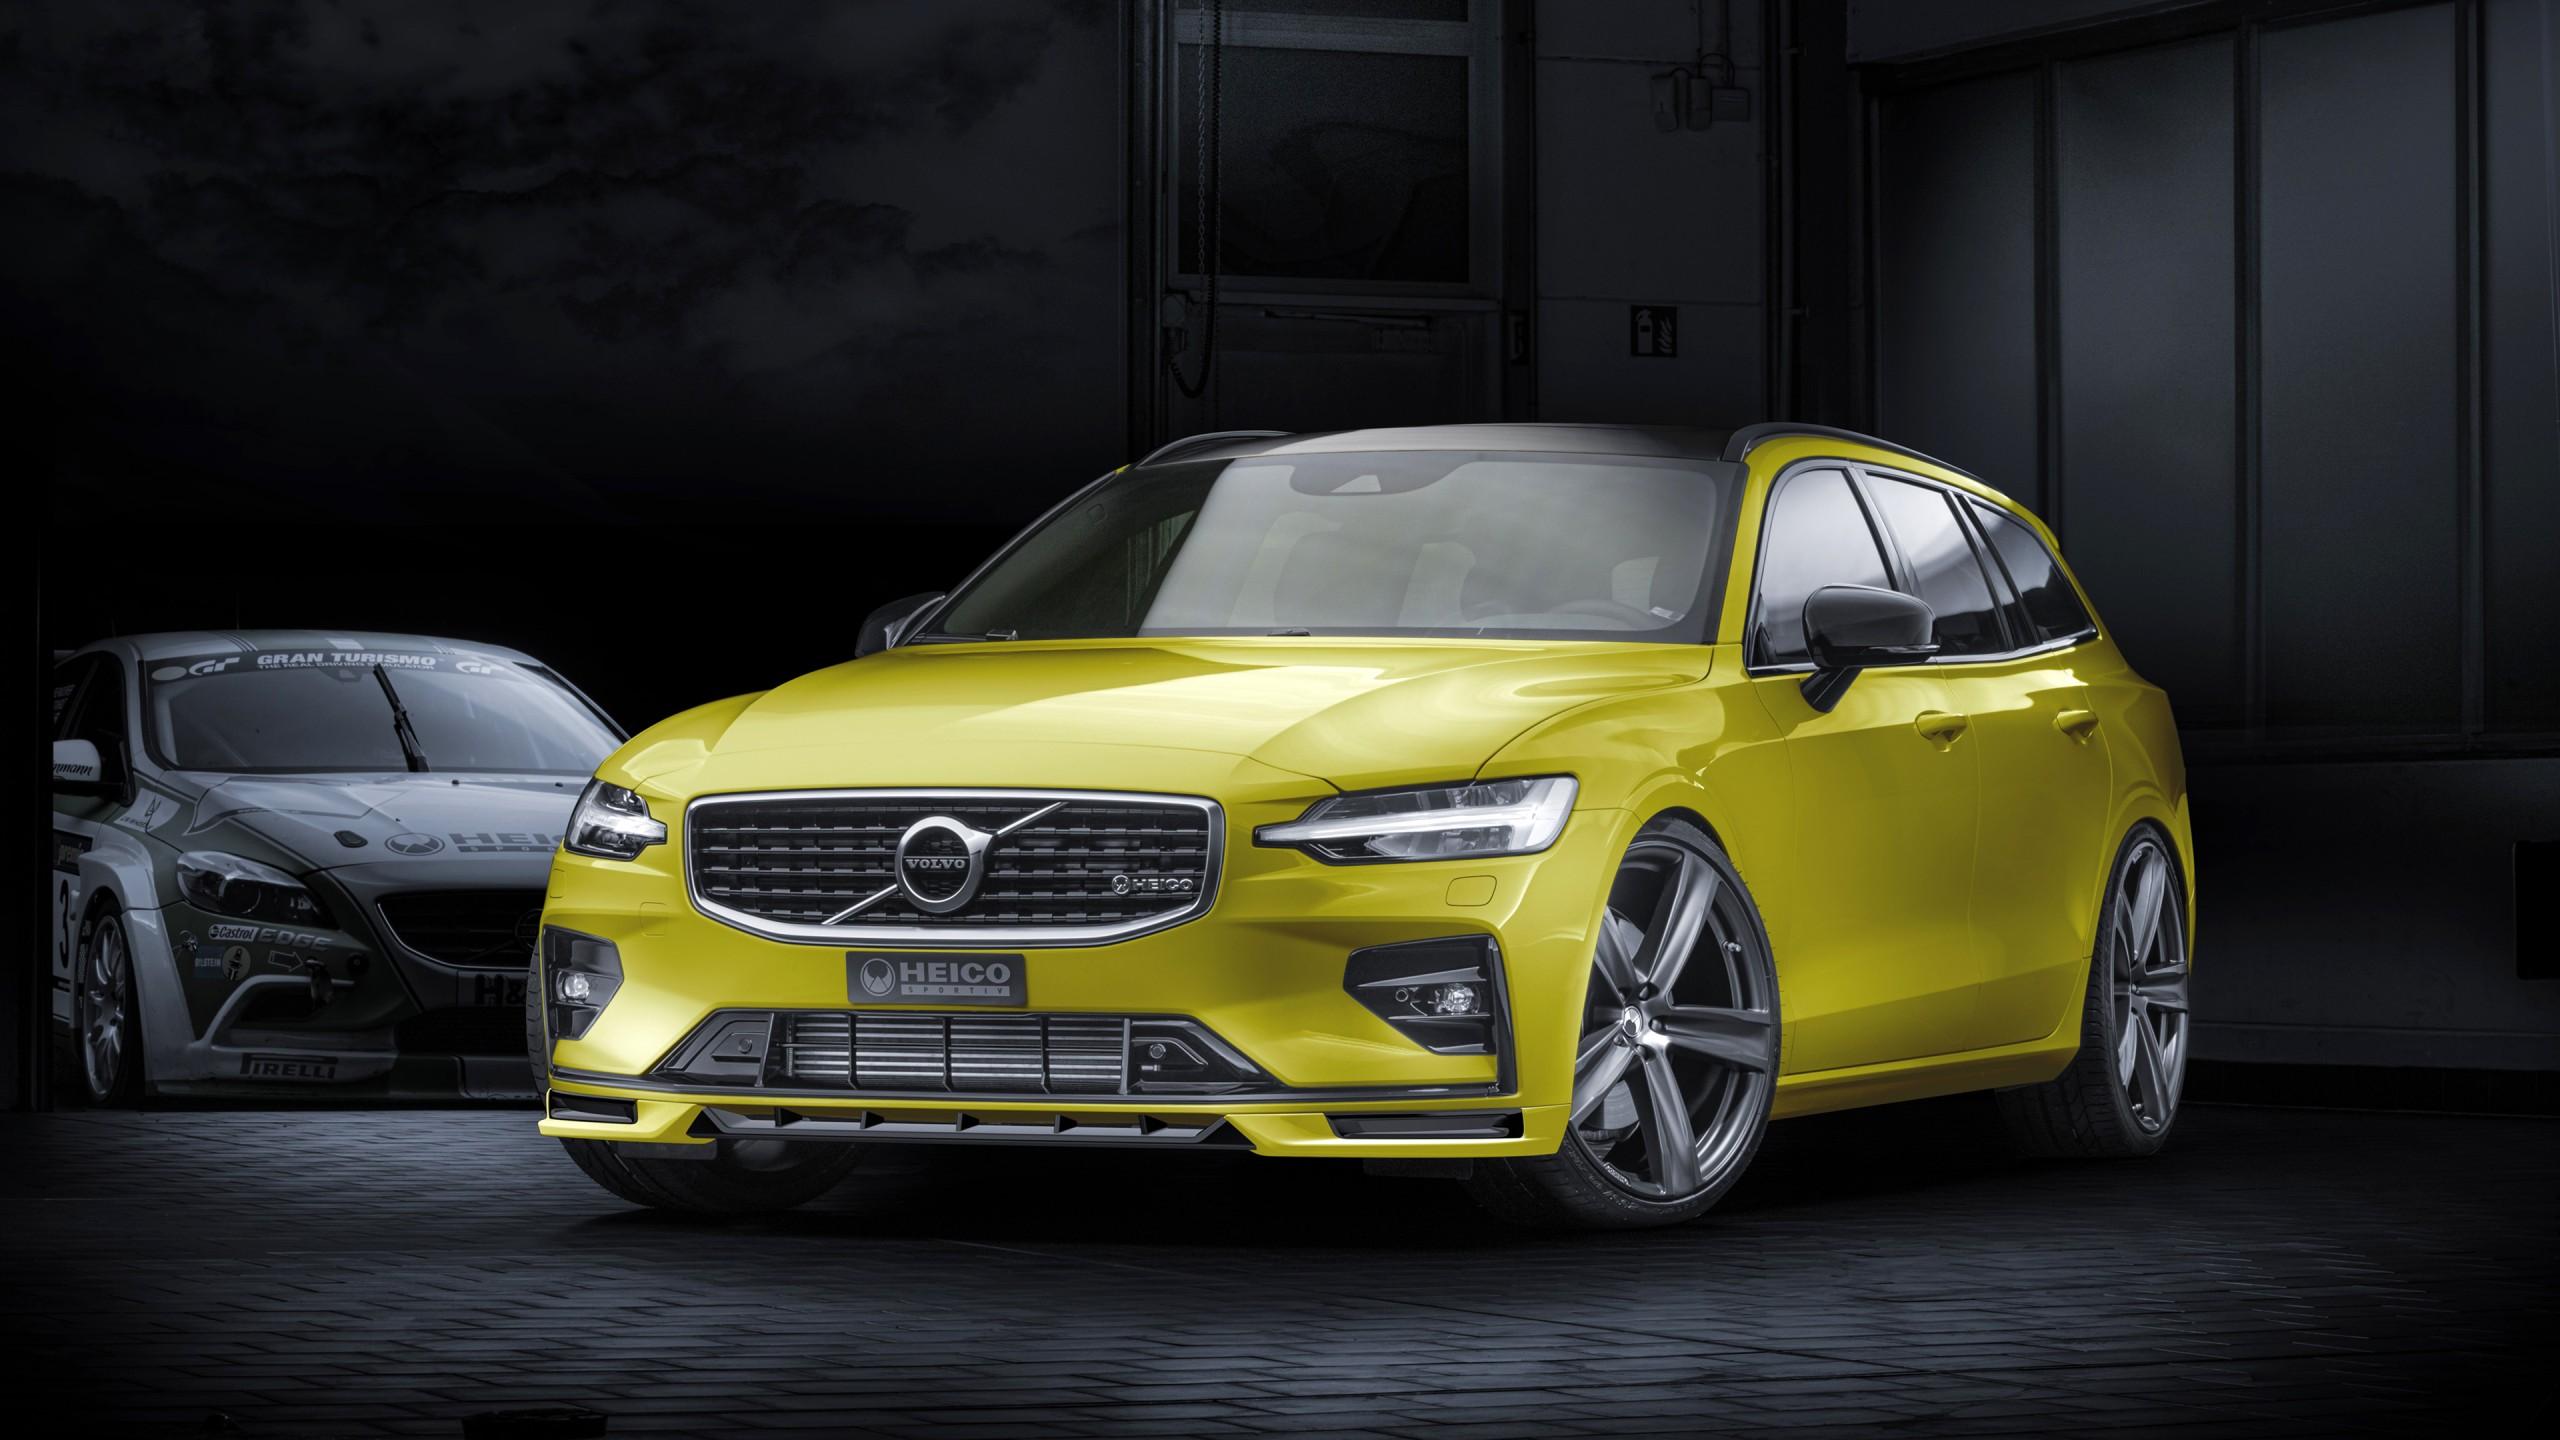 Heico Sportiv Volvo V60 T6 R Design 2019 4k Wallpaper Hd Car Wallpapers Id 13512